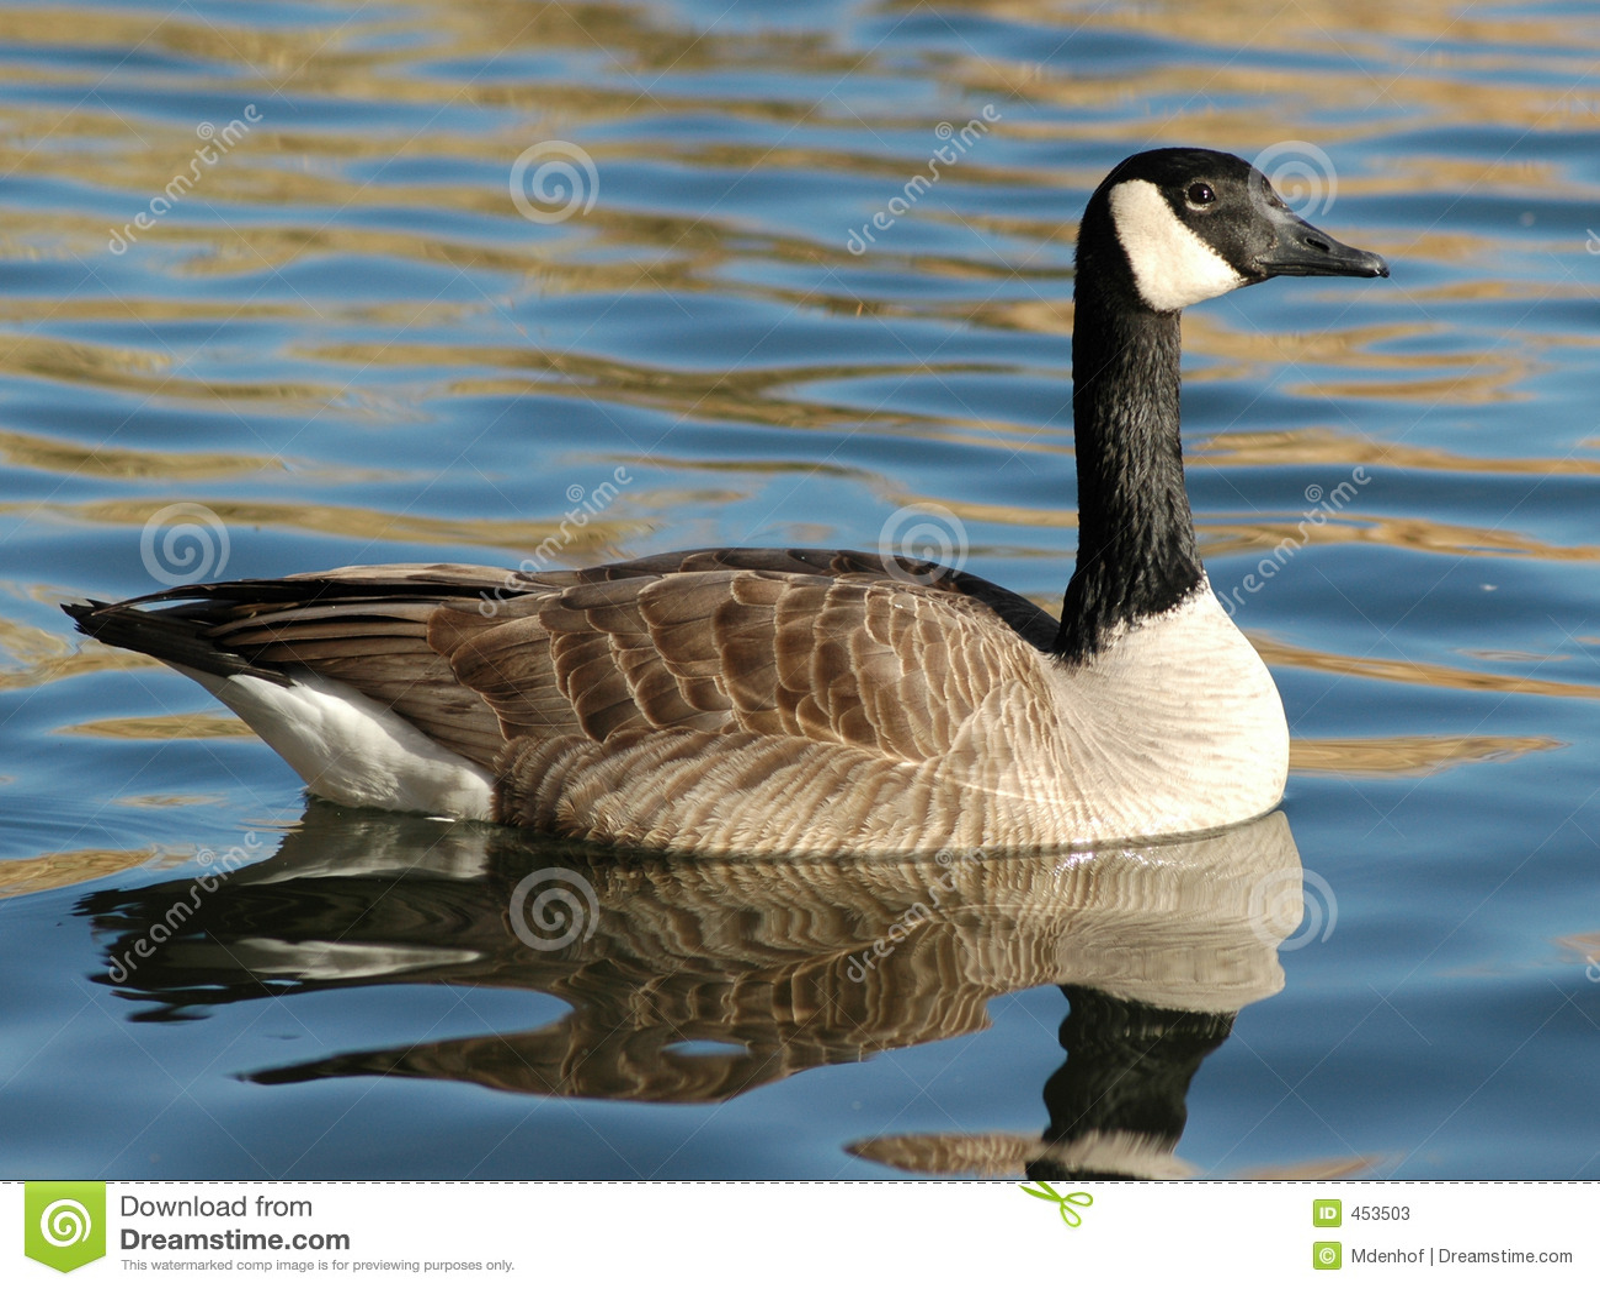 Download Canadian Goose stock image. Image of animal, swim, bill - 453503